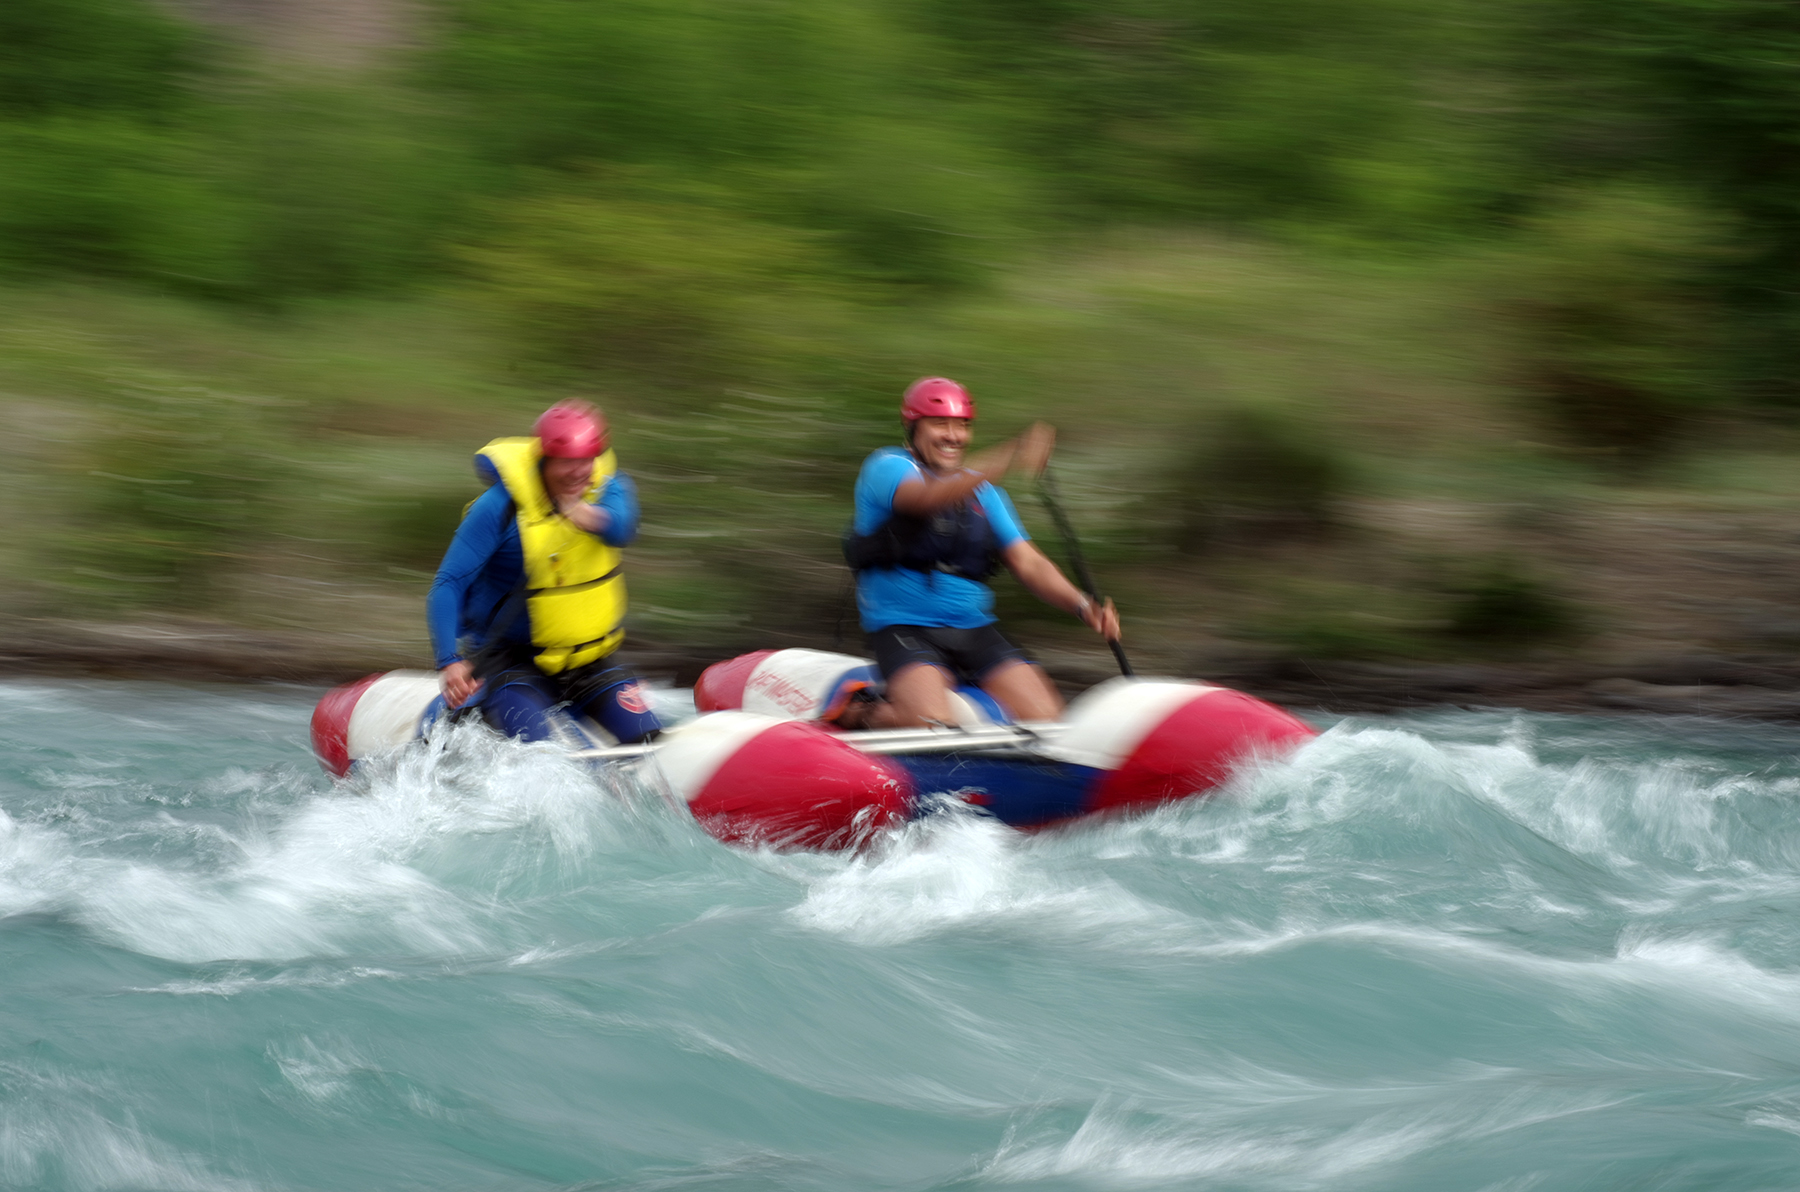 Rafting III by voldemometr